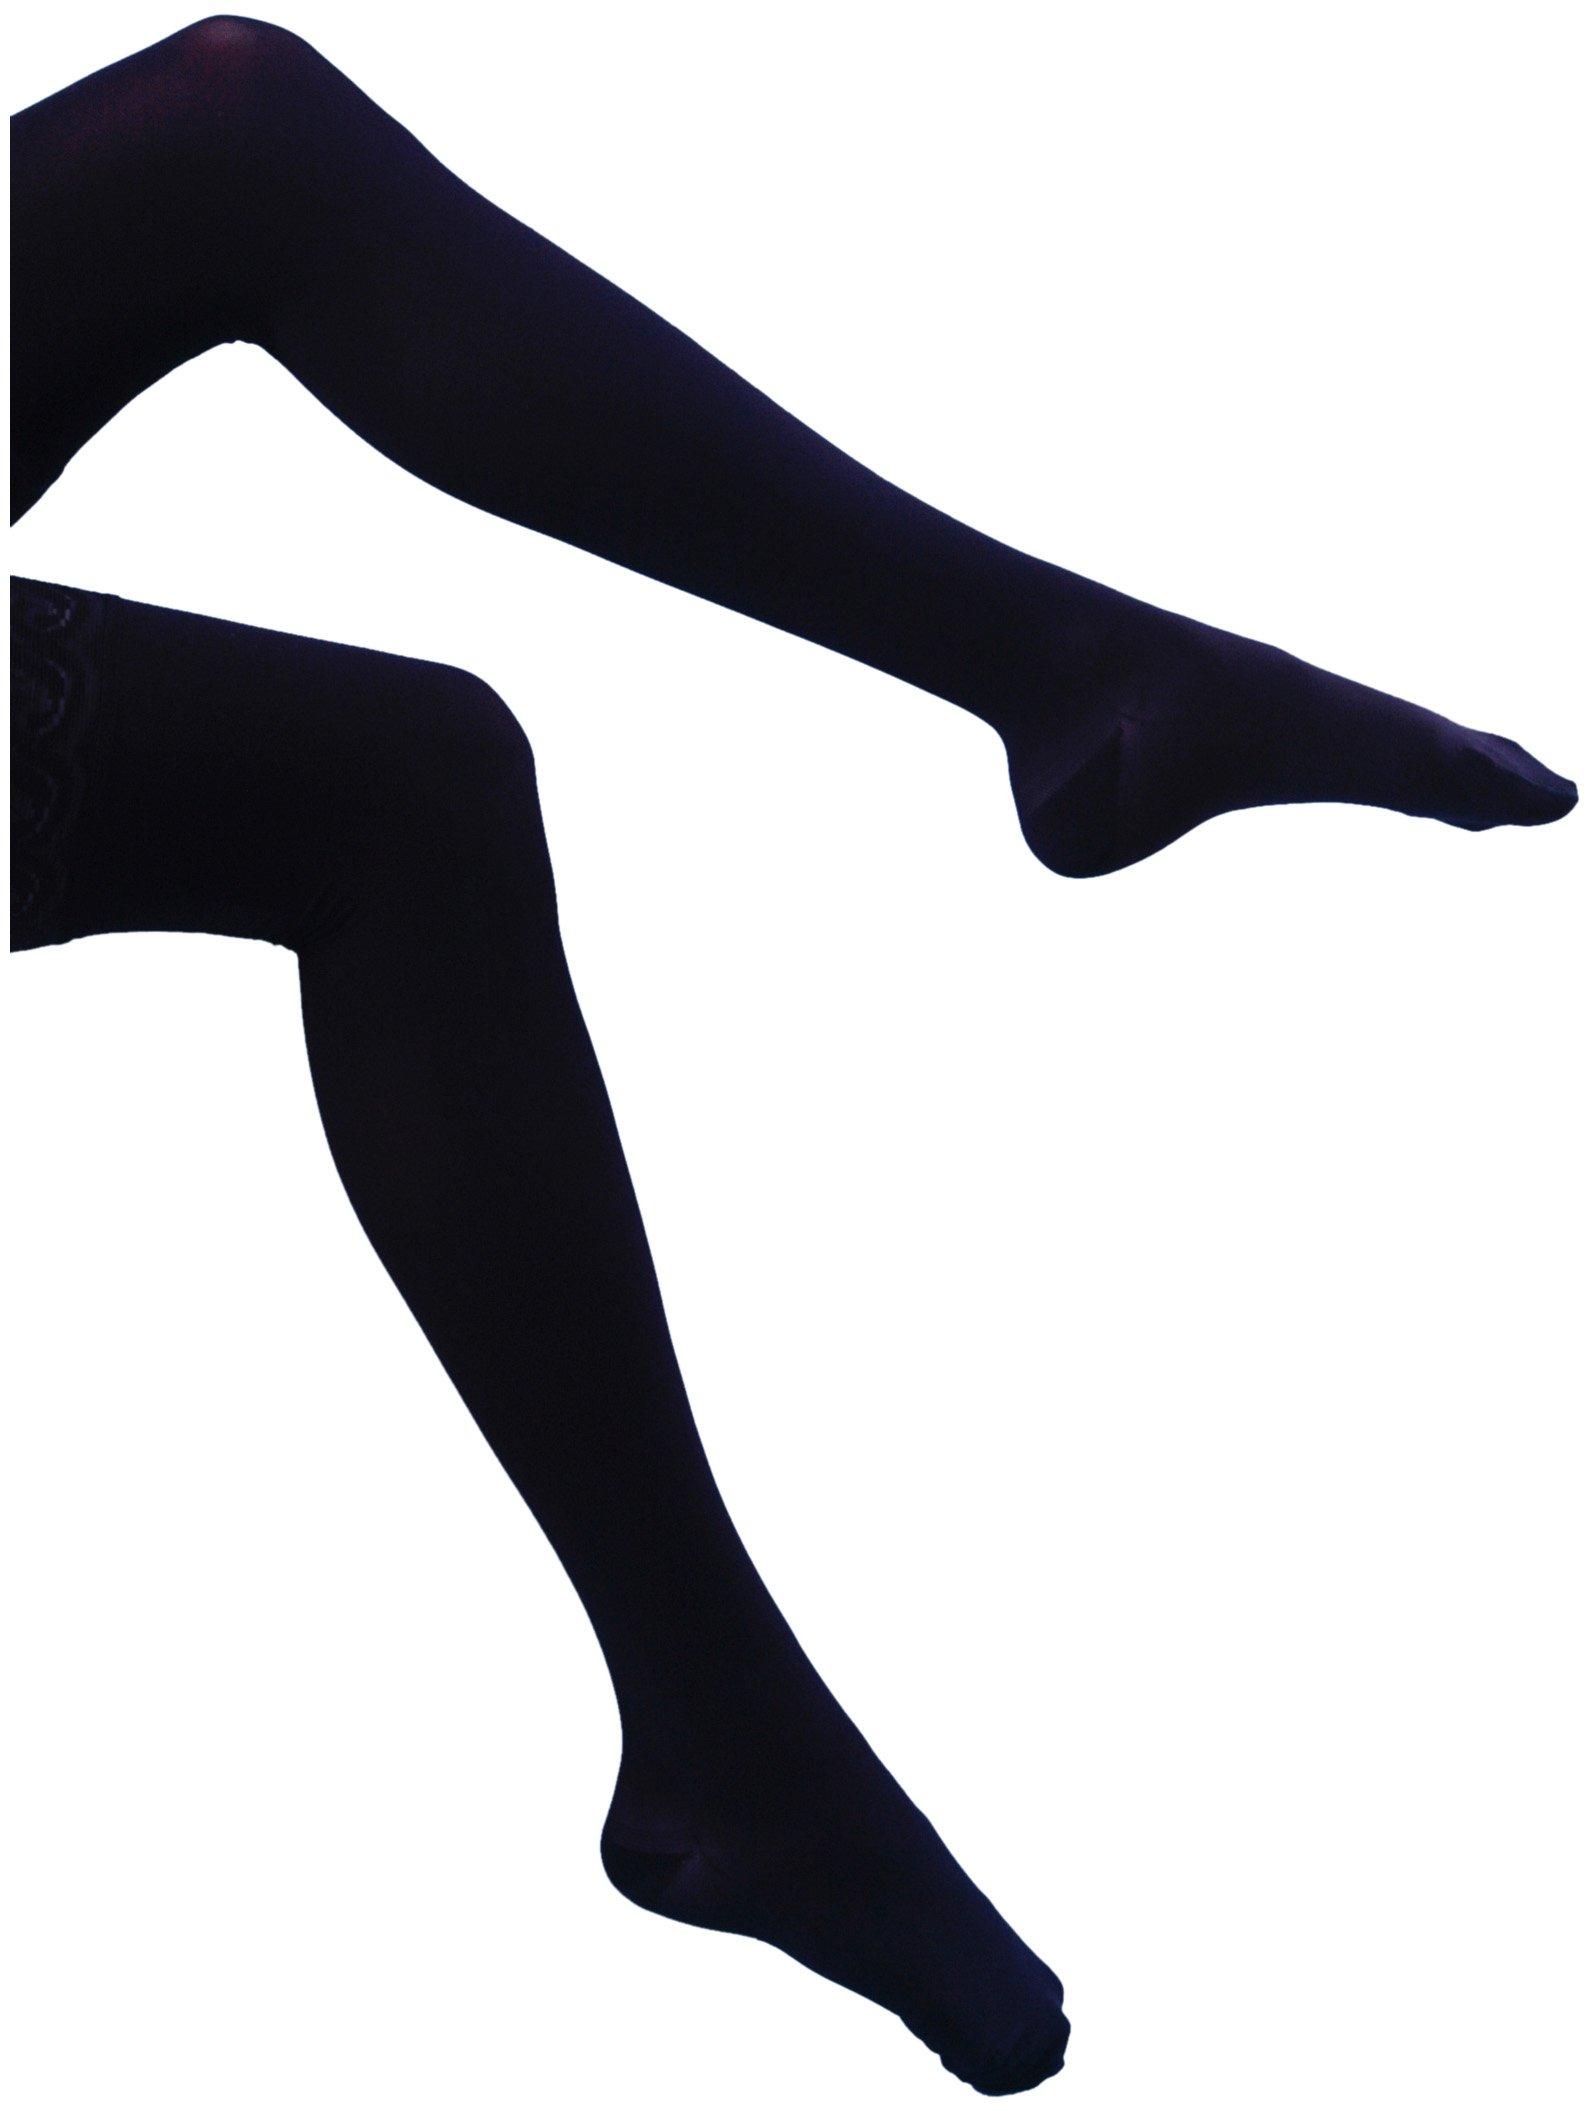 Bauerfeind VenoTrain Micro Maternity Pantyhose (ATU) 20 - 30 mmHg Compression Stockings (Black, Medium Plus Long)